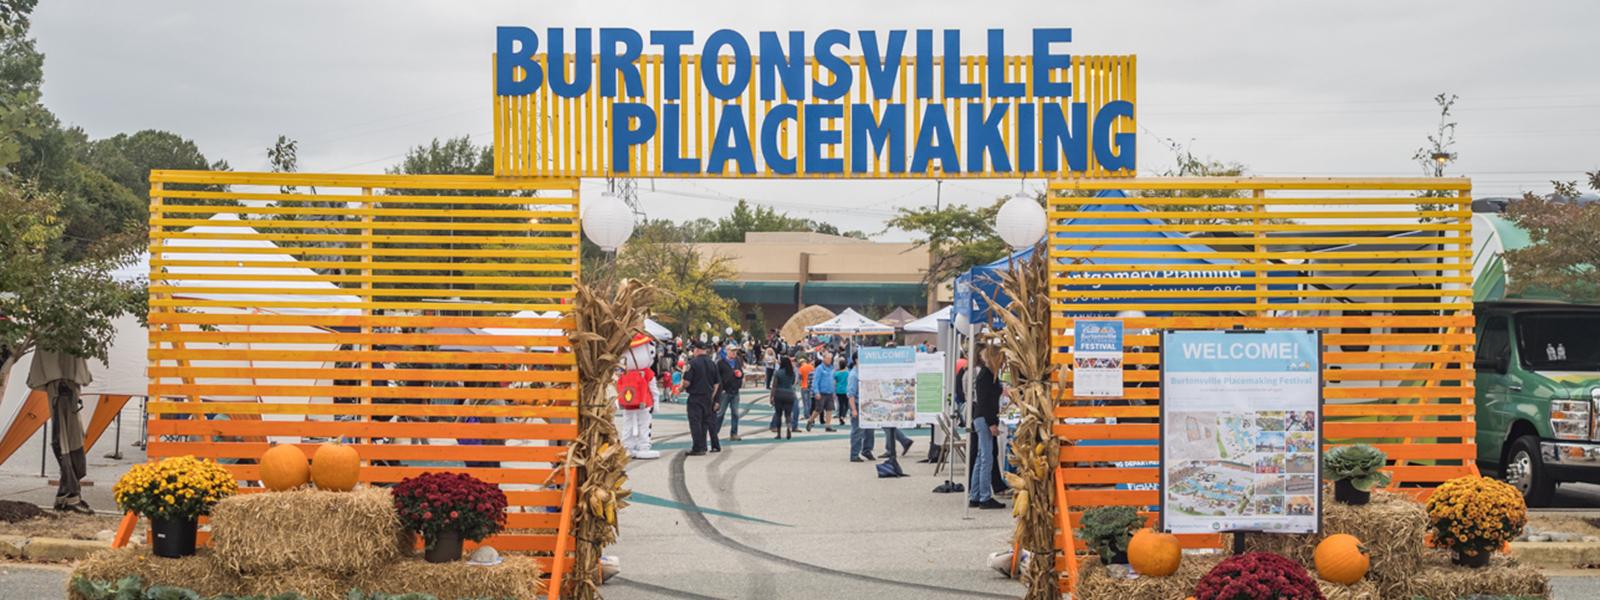 Burtonsville Placemaking Festival Recap